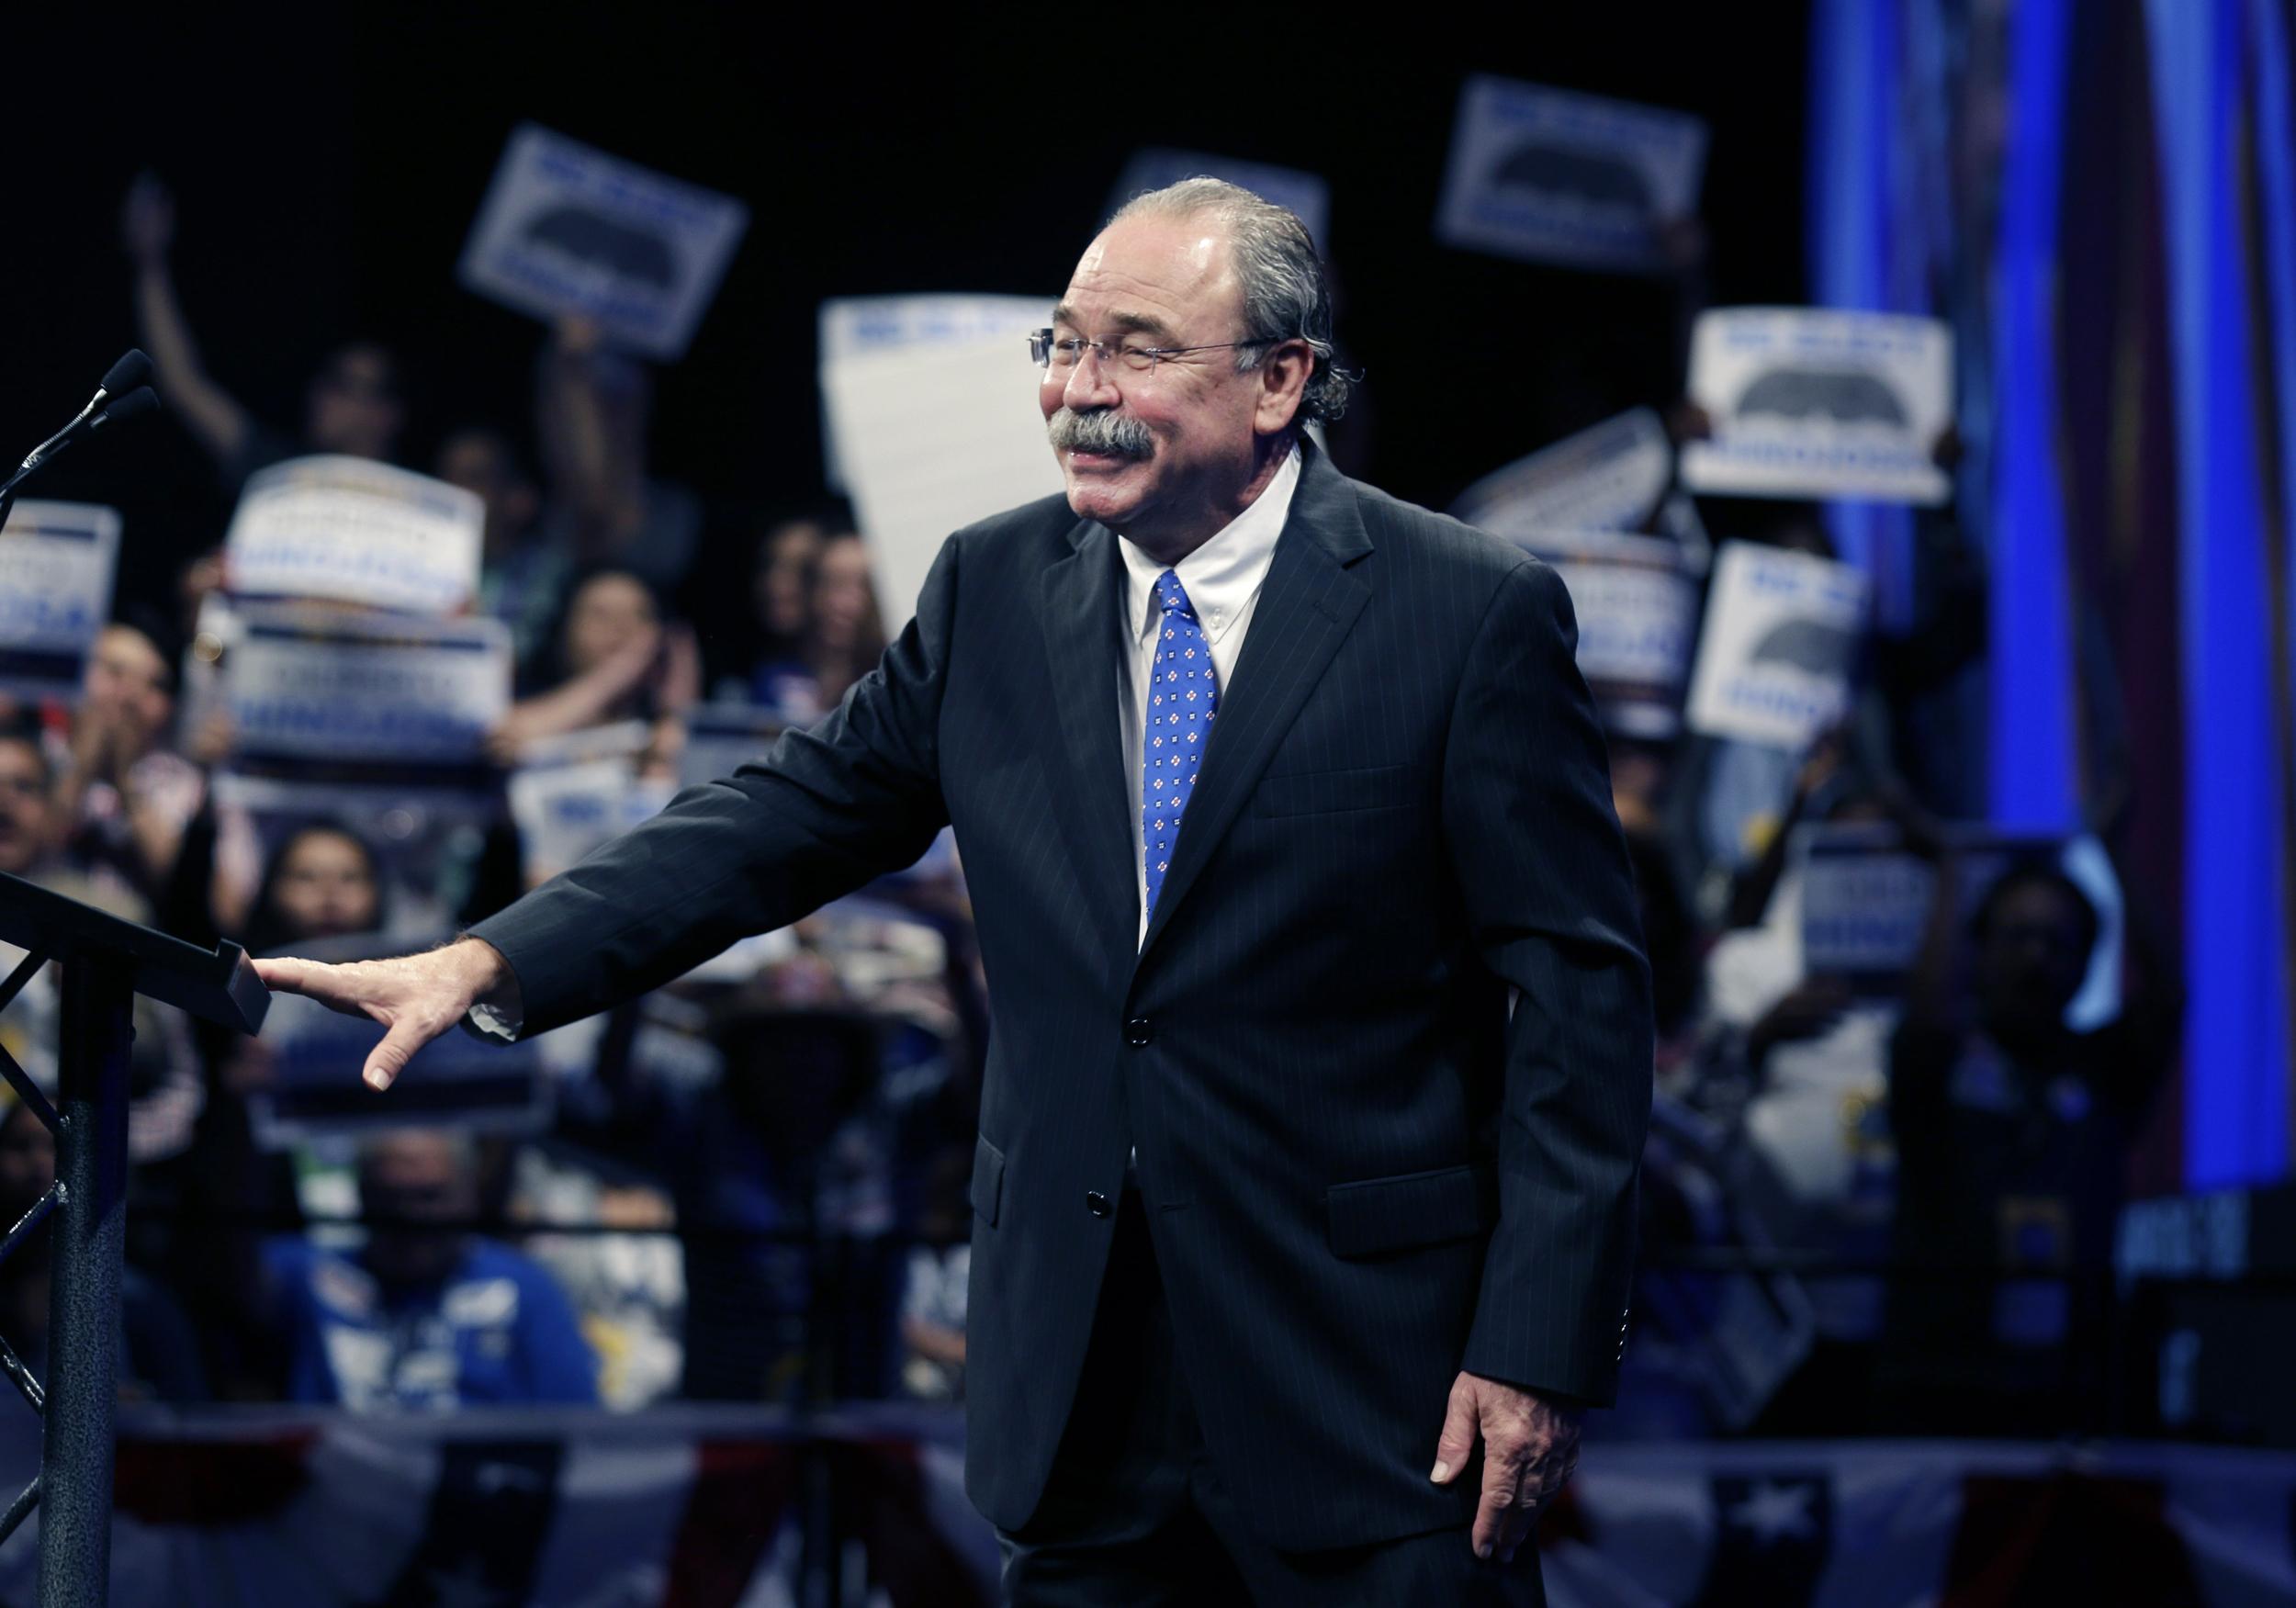 Image: Democratic Party Chairman Gilberto Hinojosa